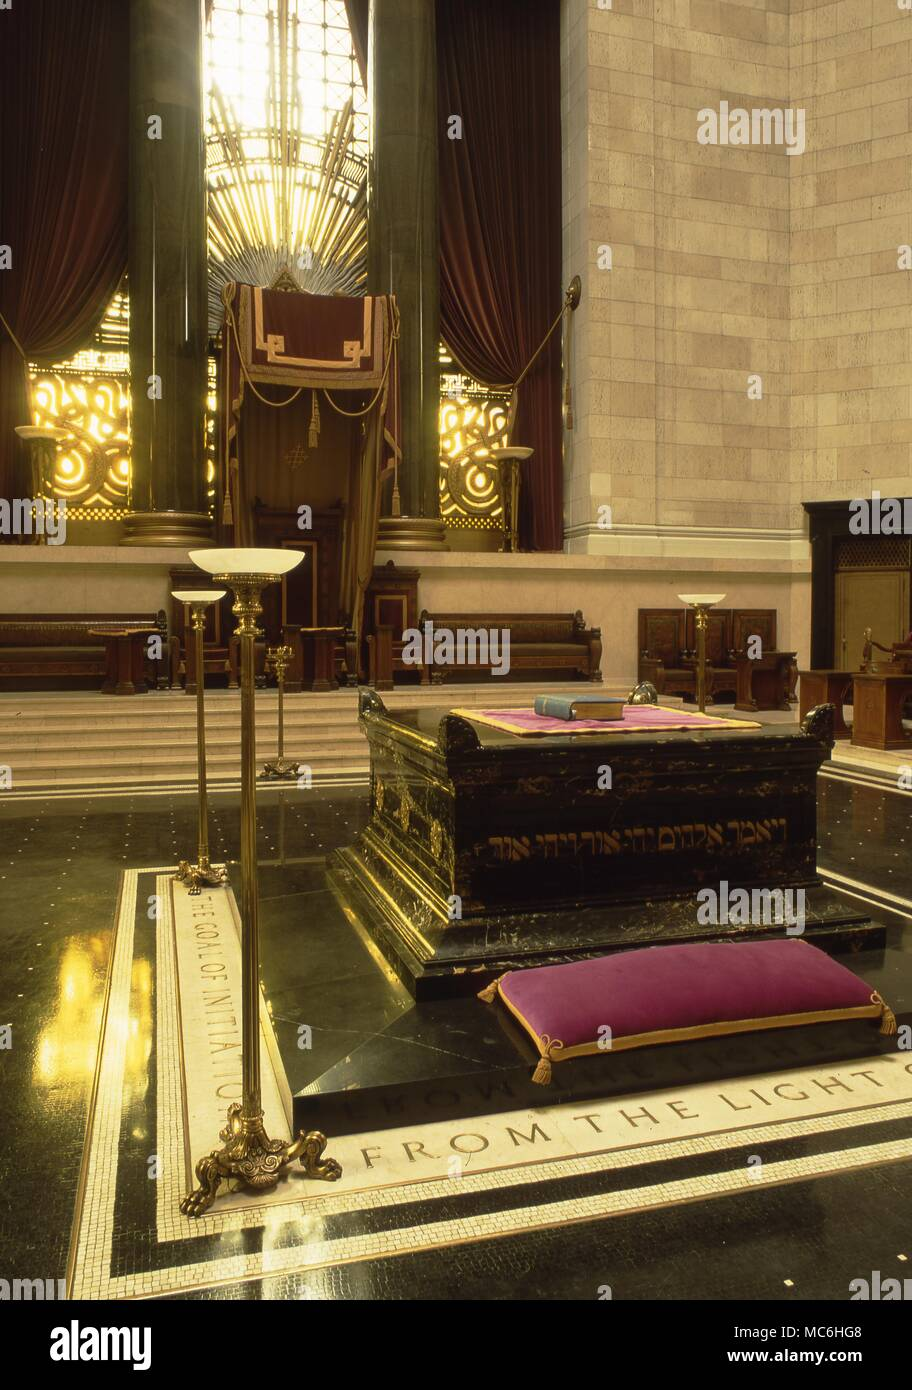 Masonic Altar Stock Photos & Masonic Altar Stock Images - Alamy